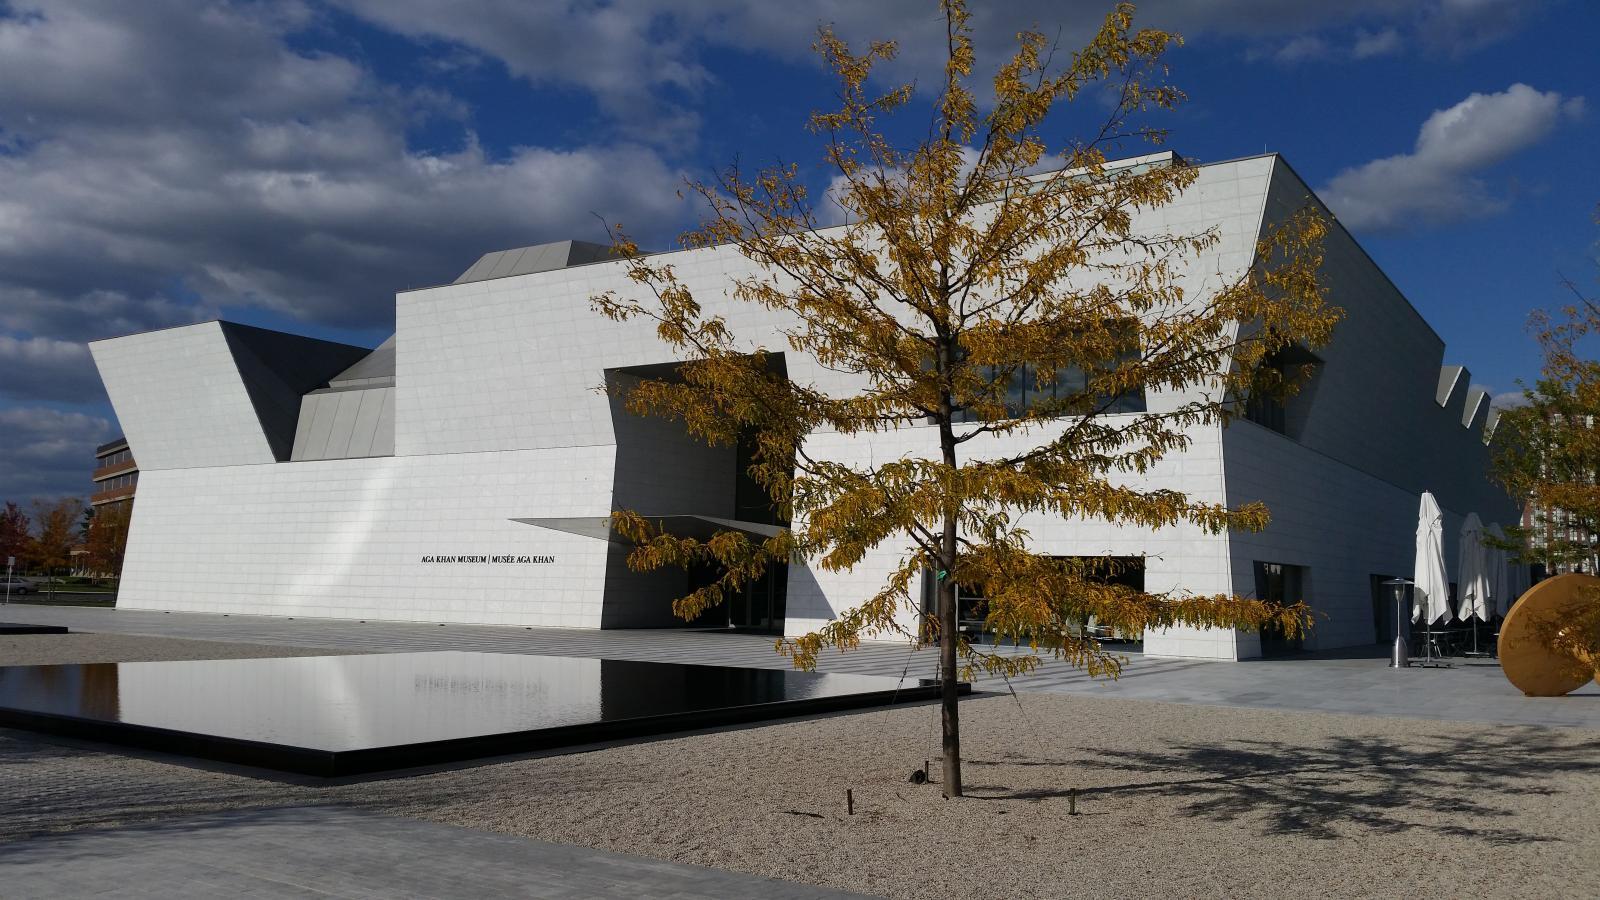 L'Aga Khan Museum, à Toronto, Canada. PHOTO JohnOyston (CC)